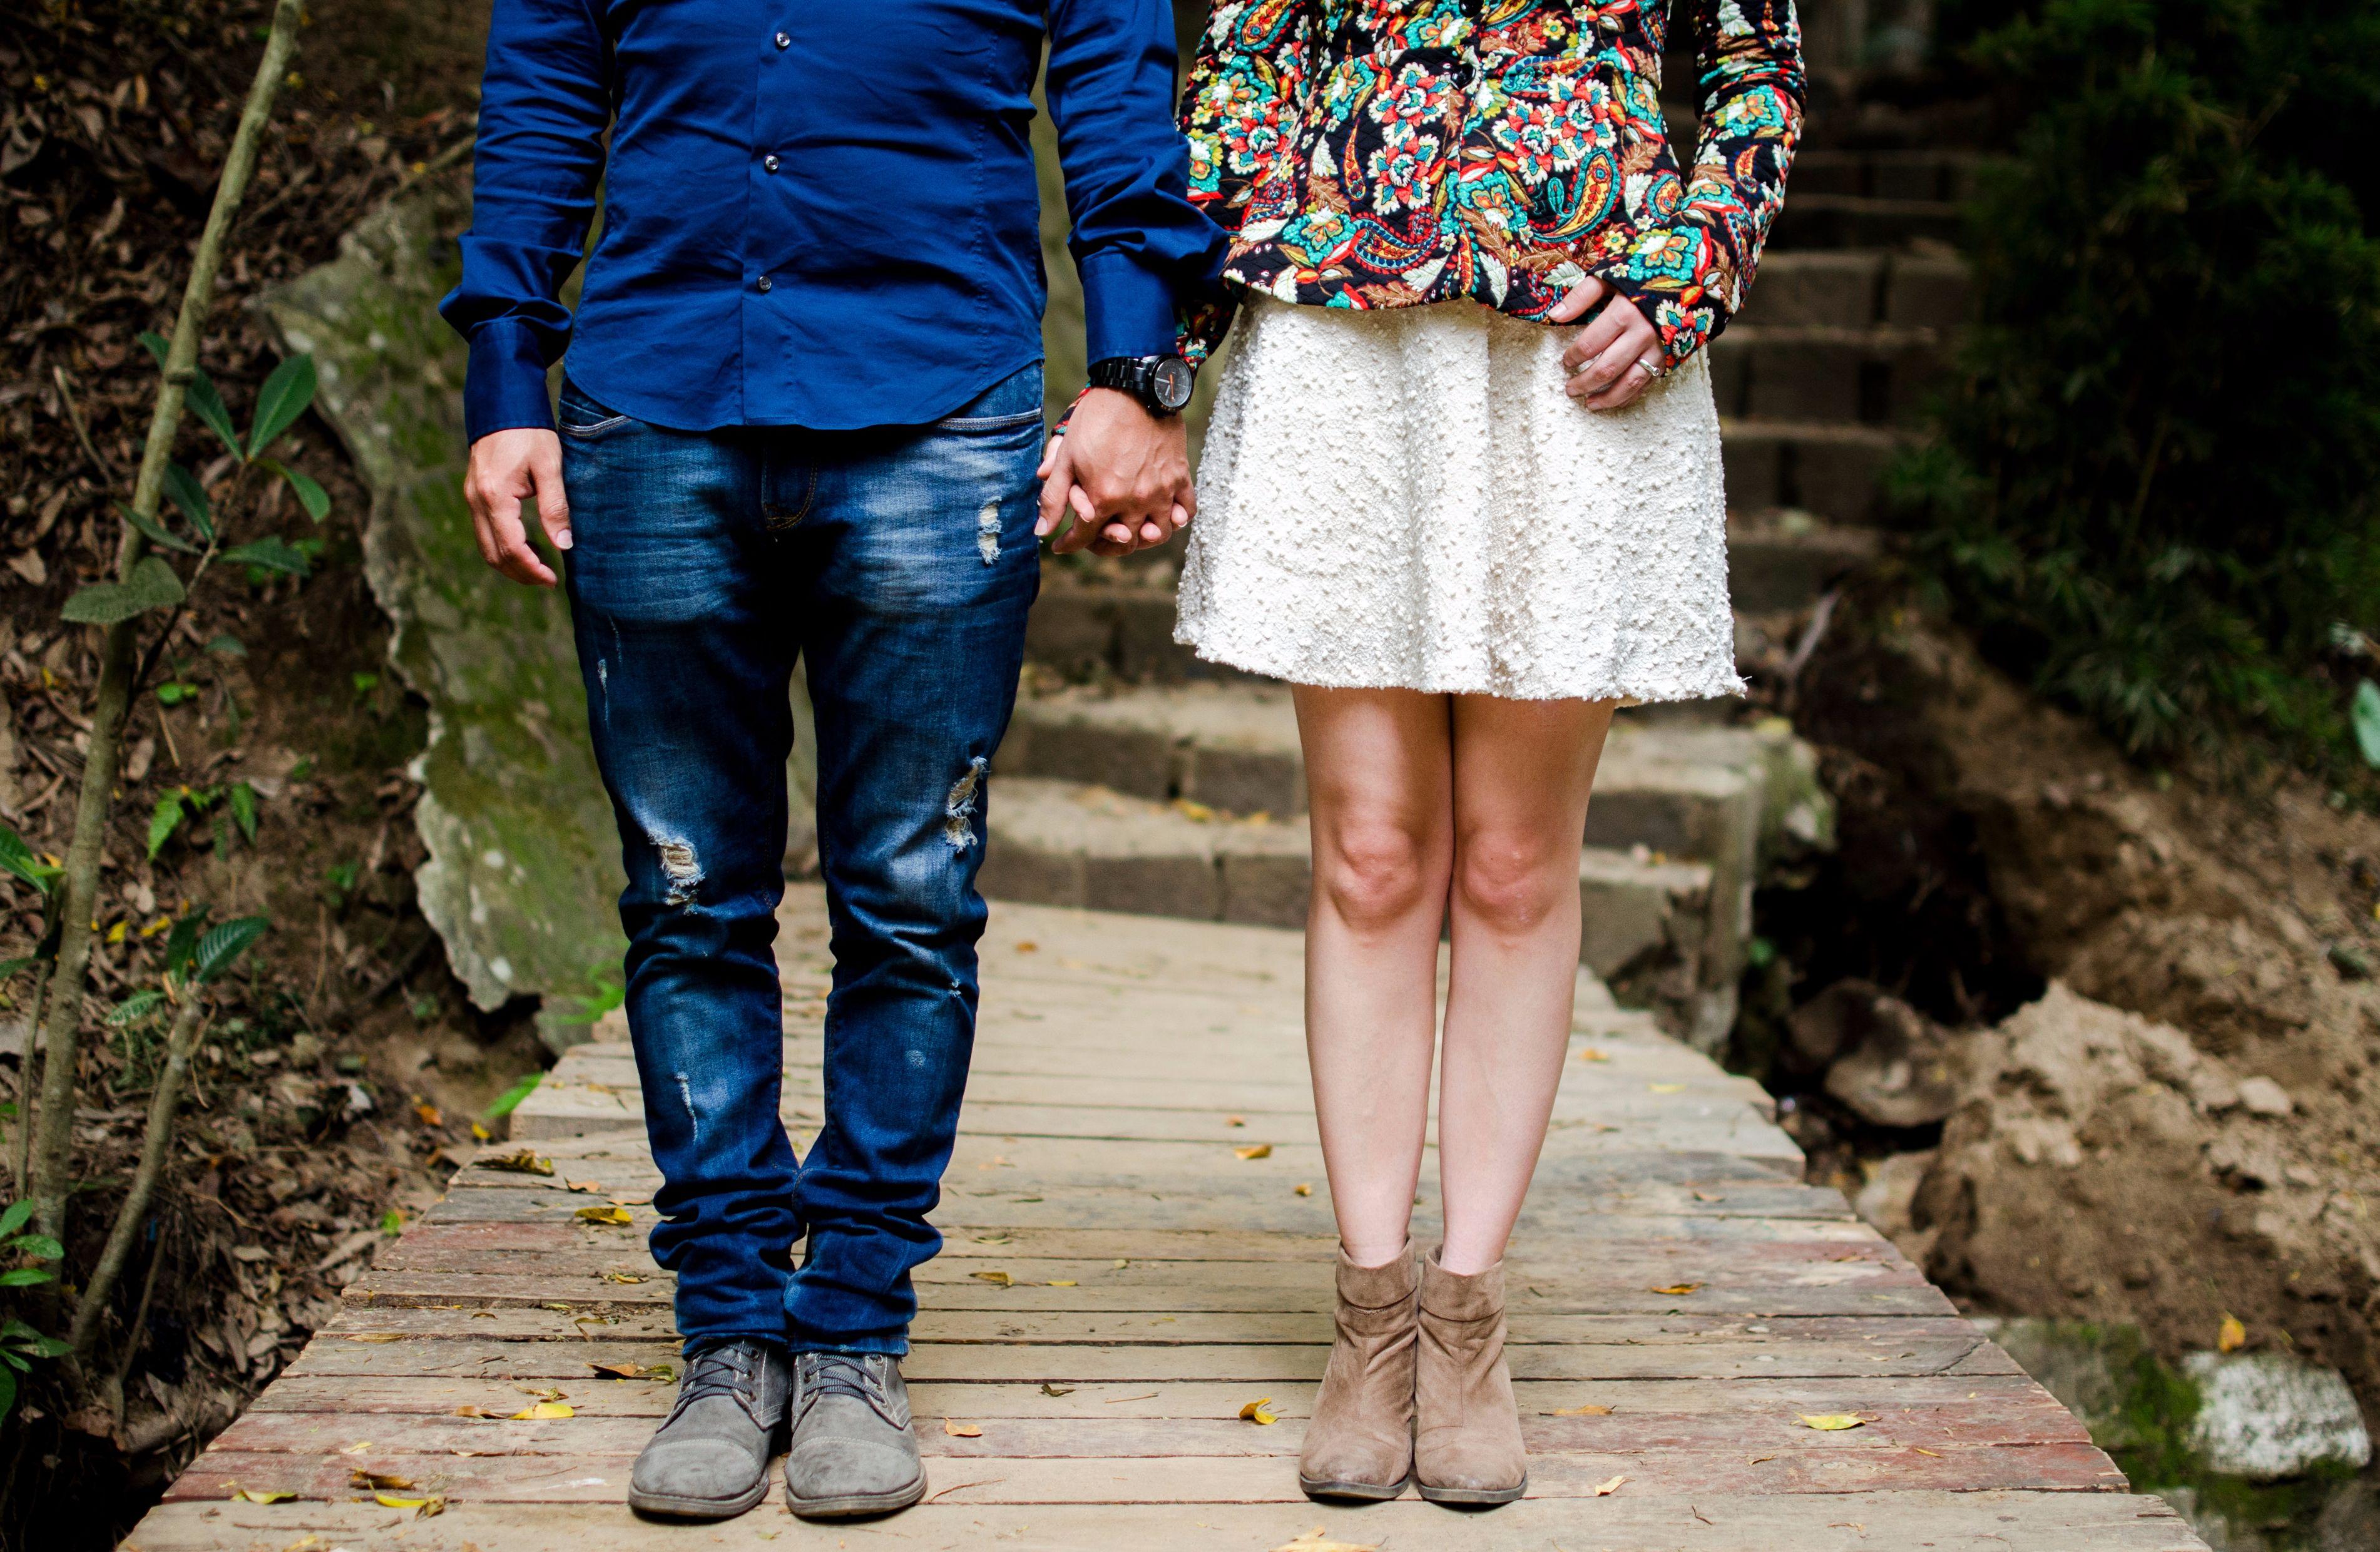 Photo by Adriana Velasquez, Unsplash.com